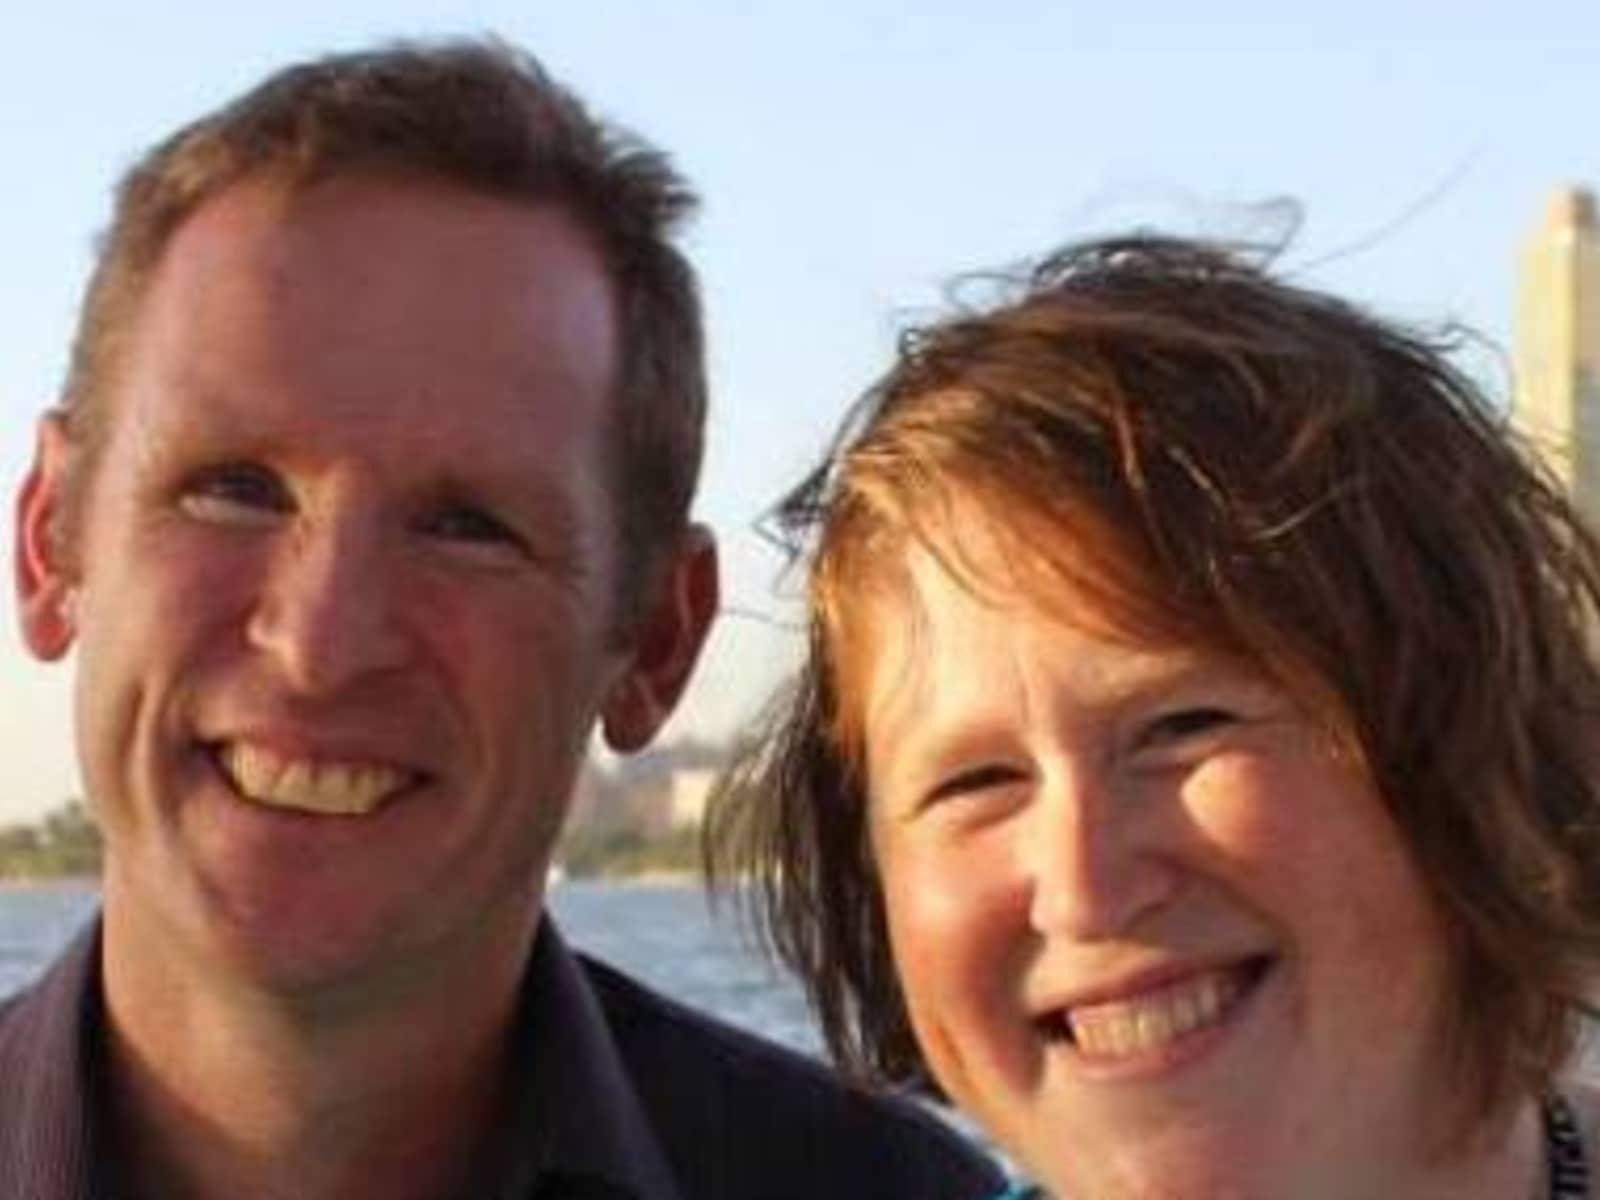 Heather & Chris from São Paulo, Brazil